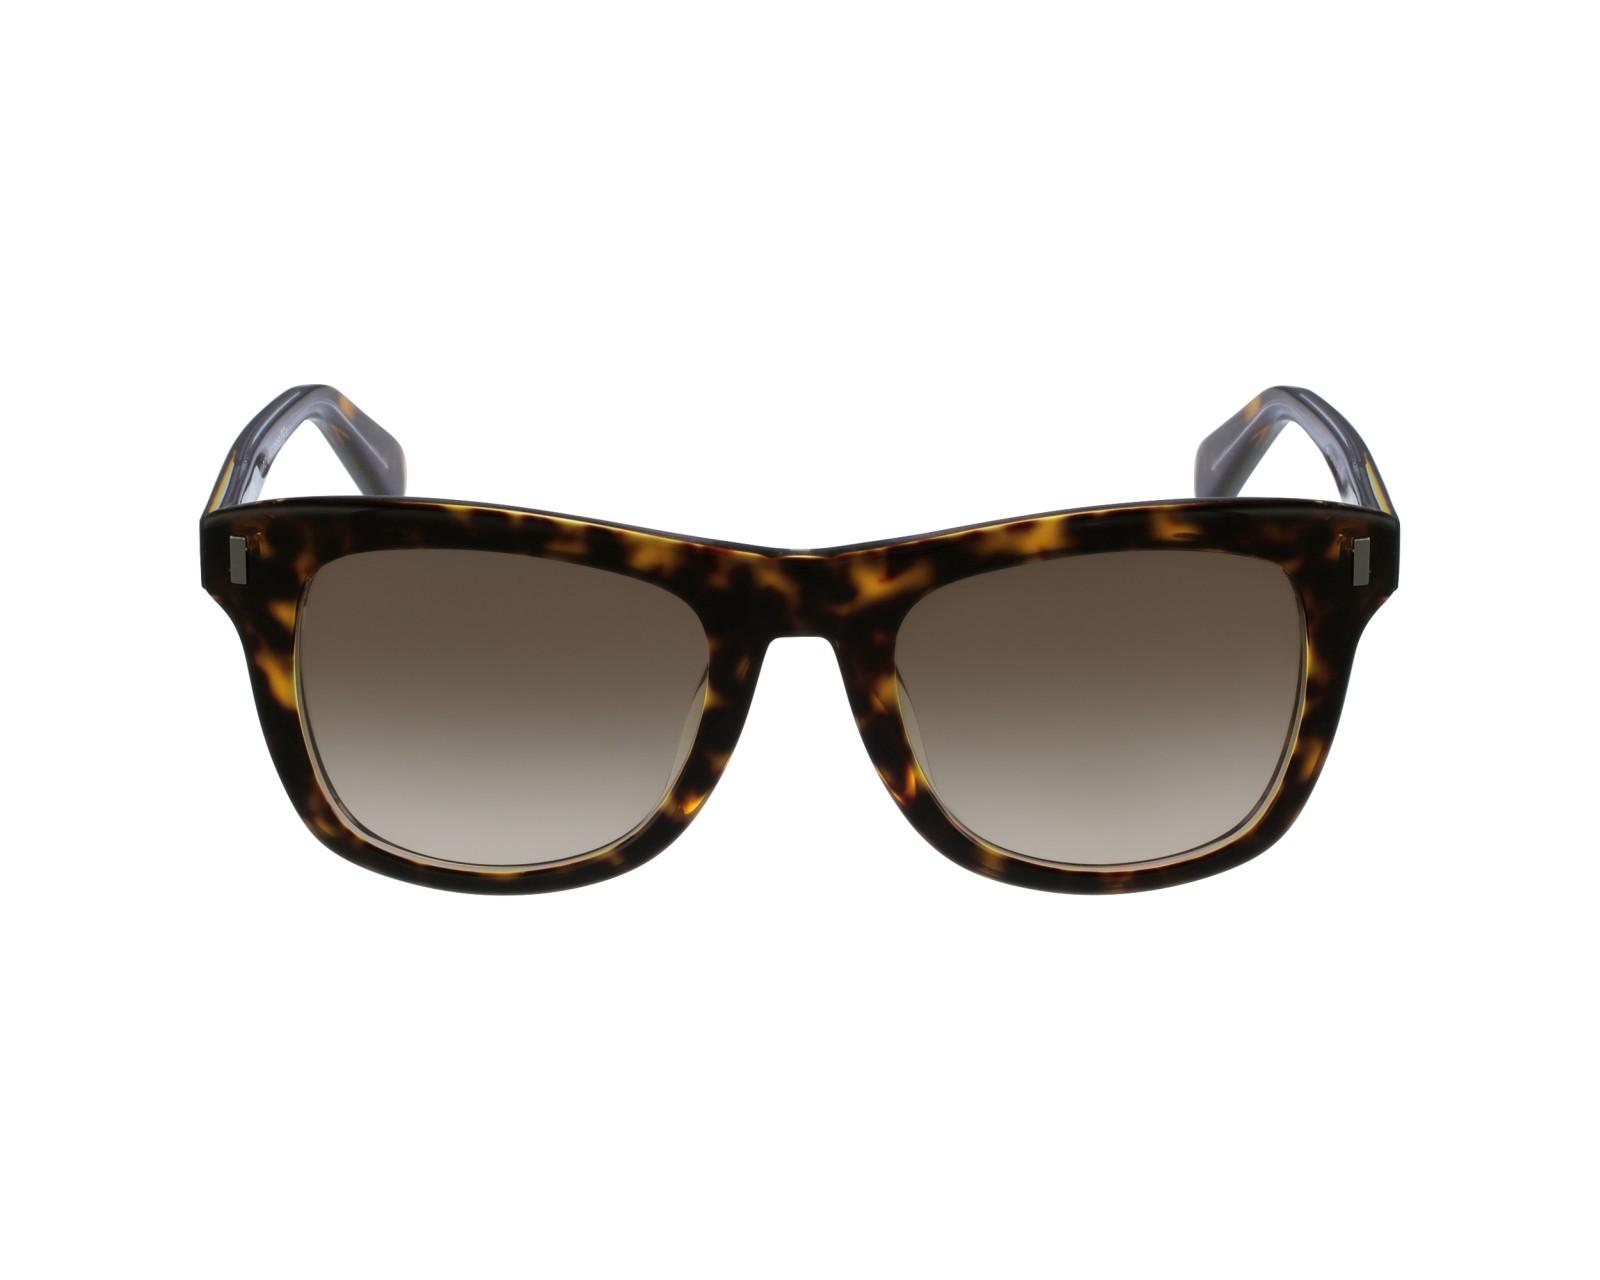 marc jacobs sunglasses  Marc by Marc Jacobs sunglasses MMJ 432/S KRZHA 50